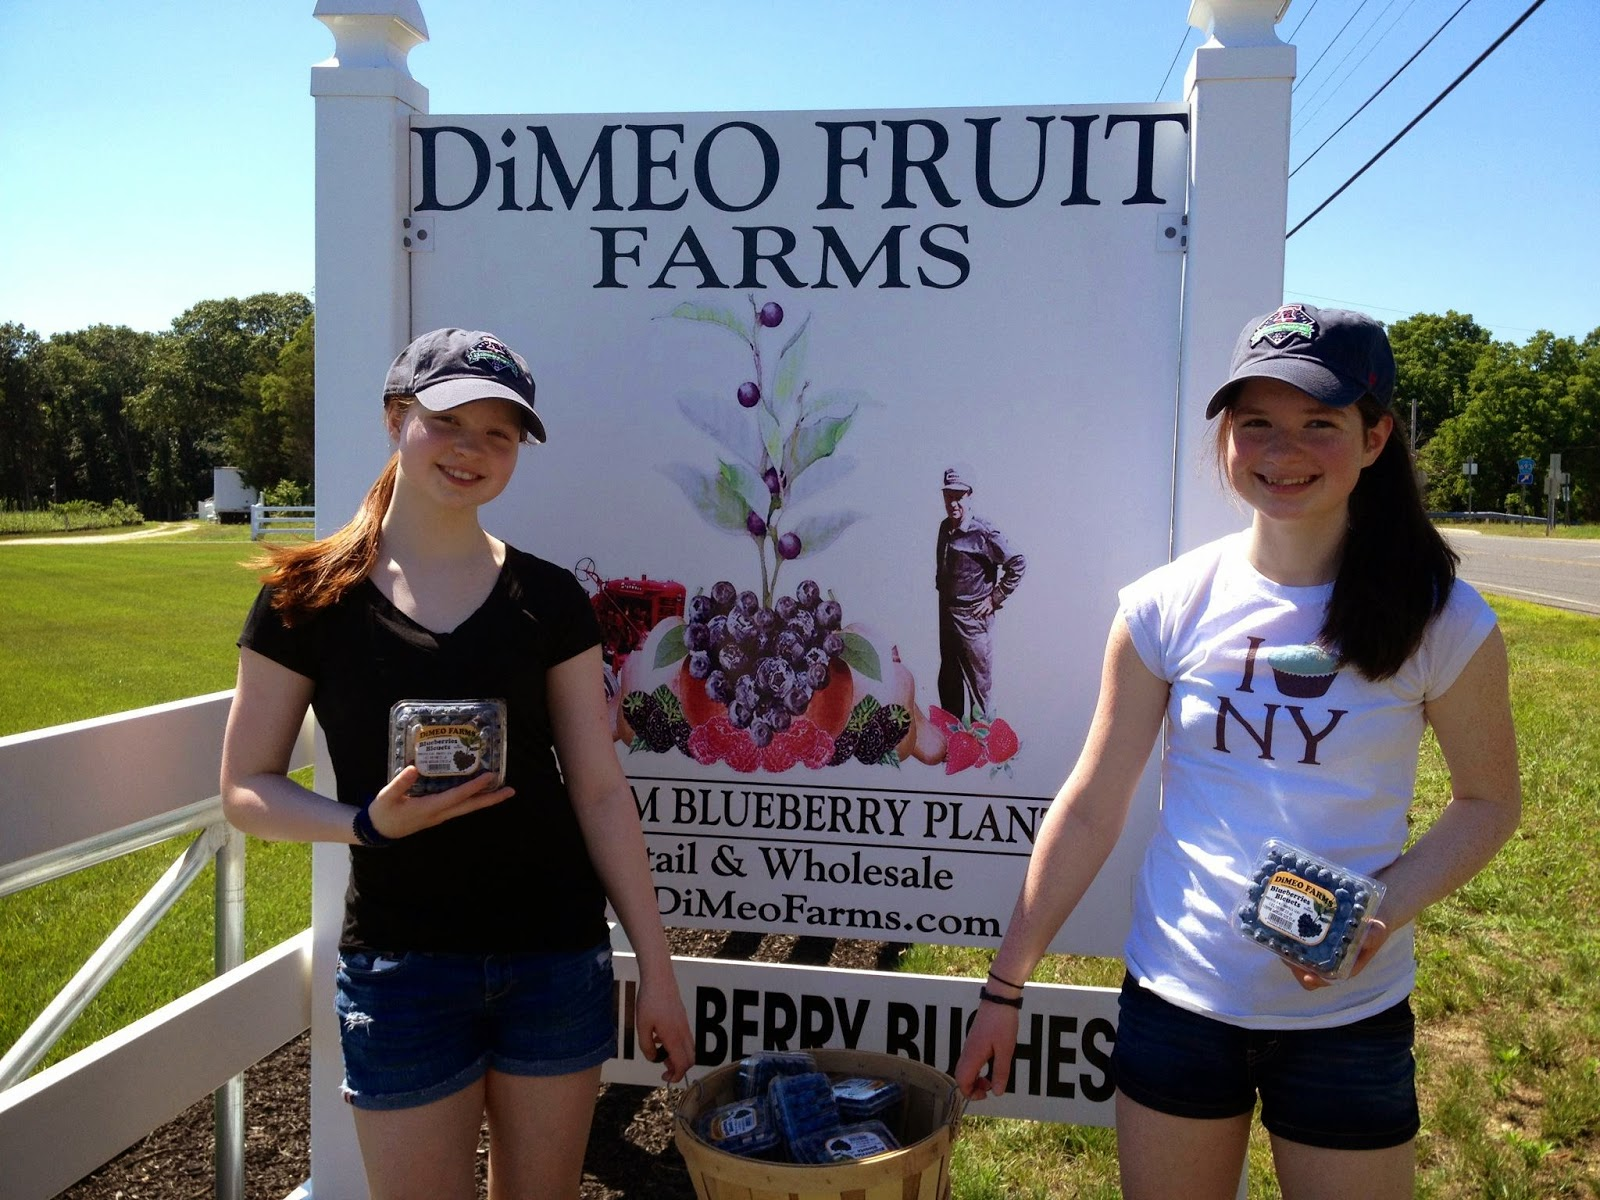 Blueberry Plants For Dimeo Farms Nurseries 609 561 5905